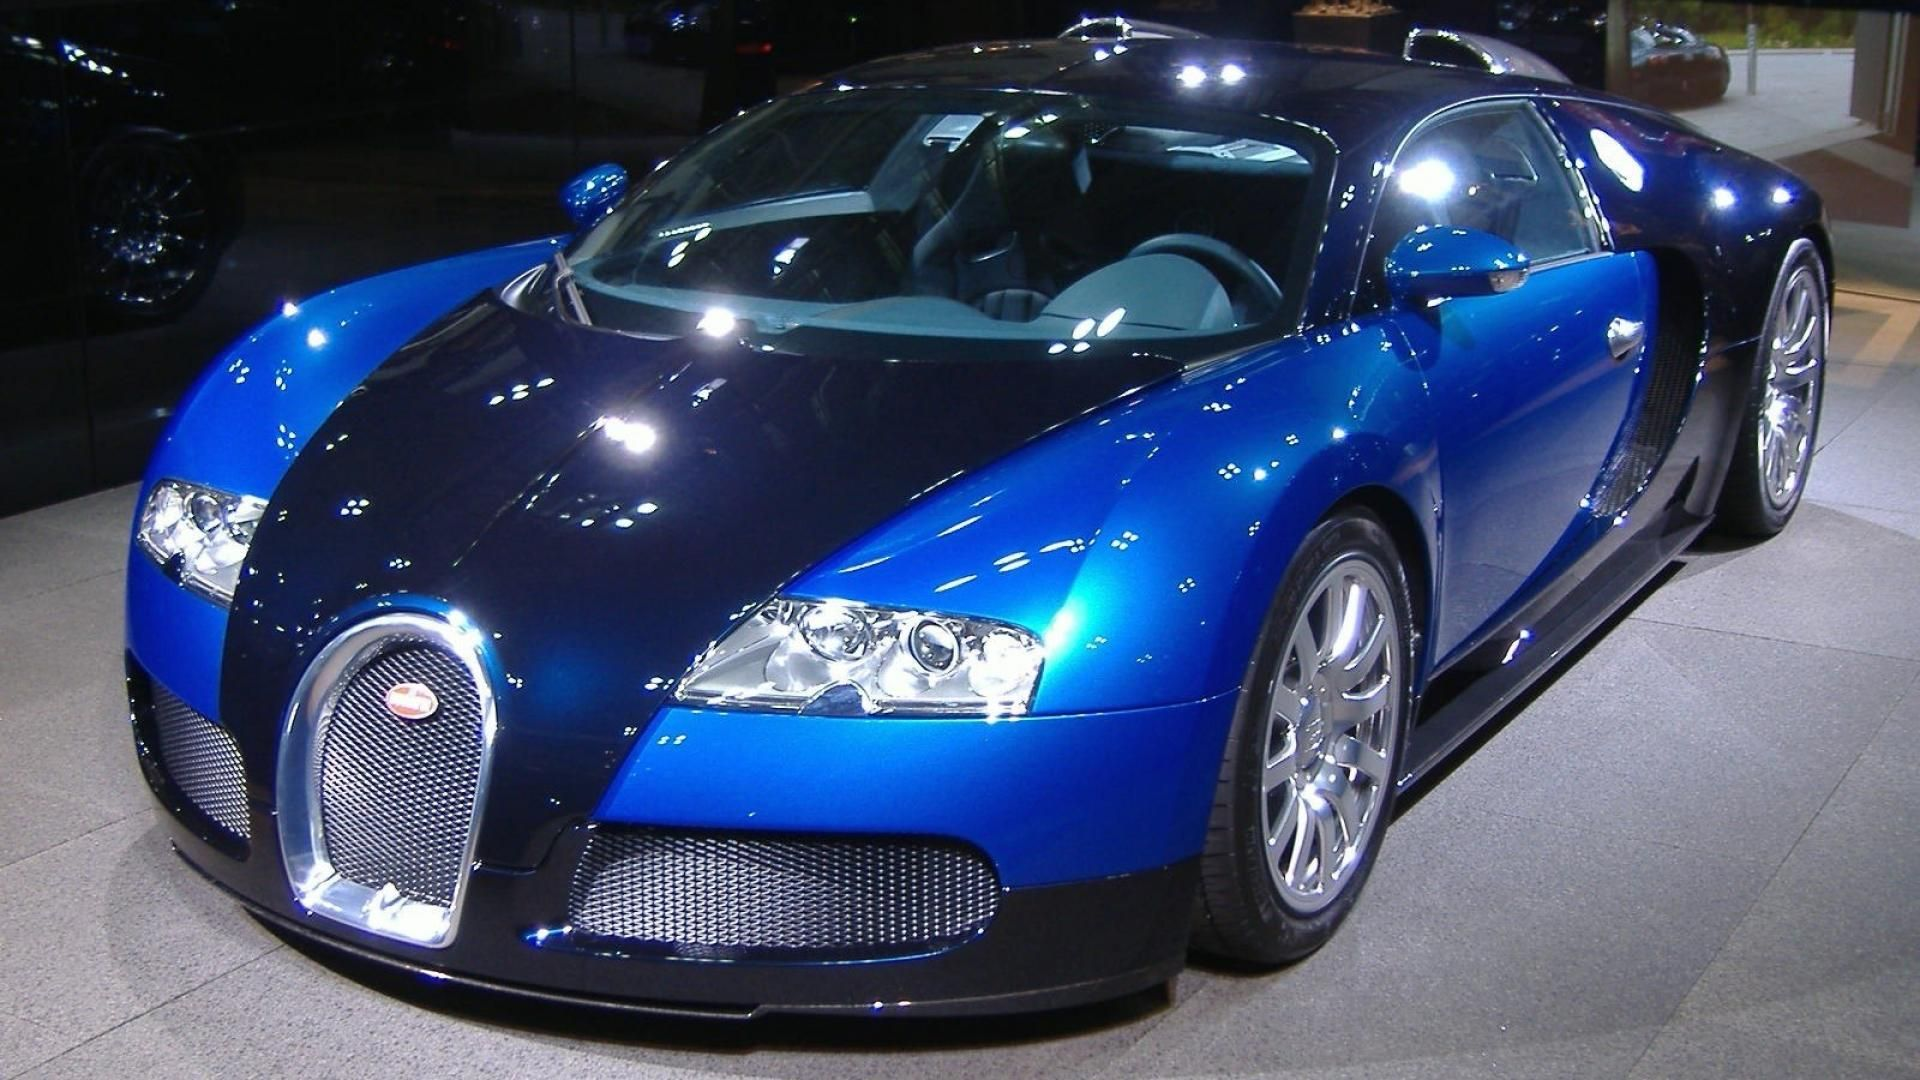 Bugatti Veyron Car HD Wallpaper 1080p